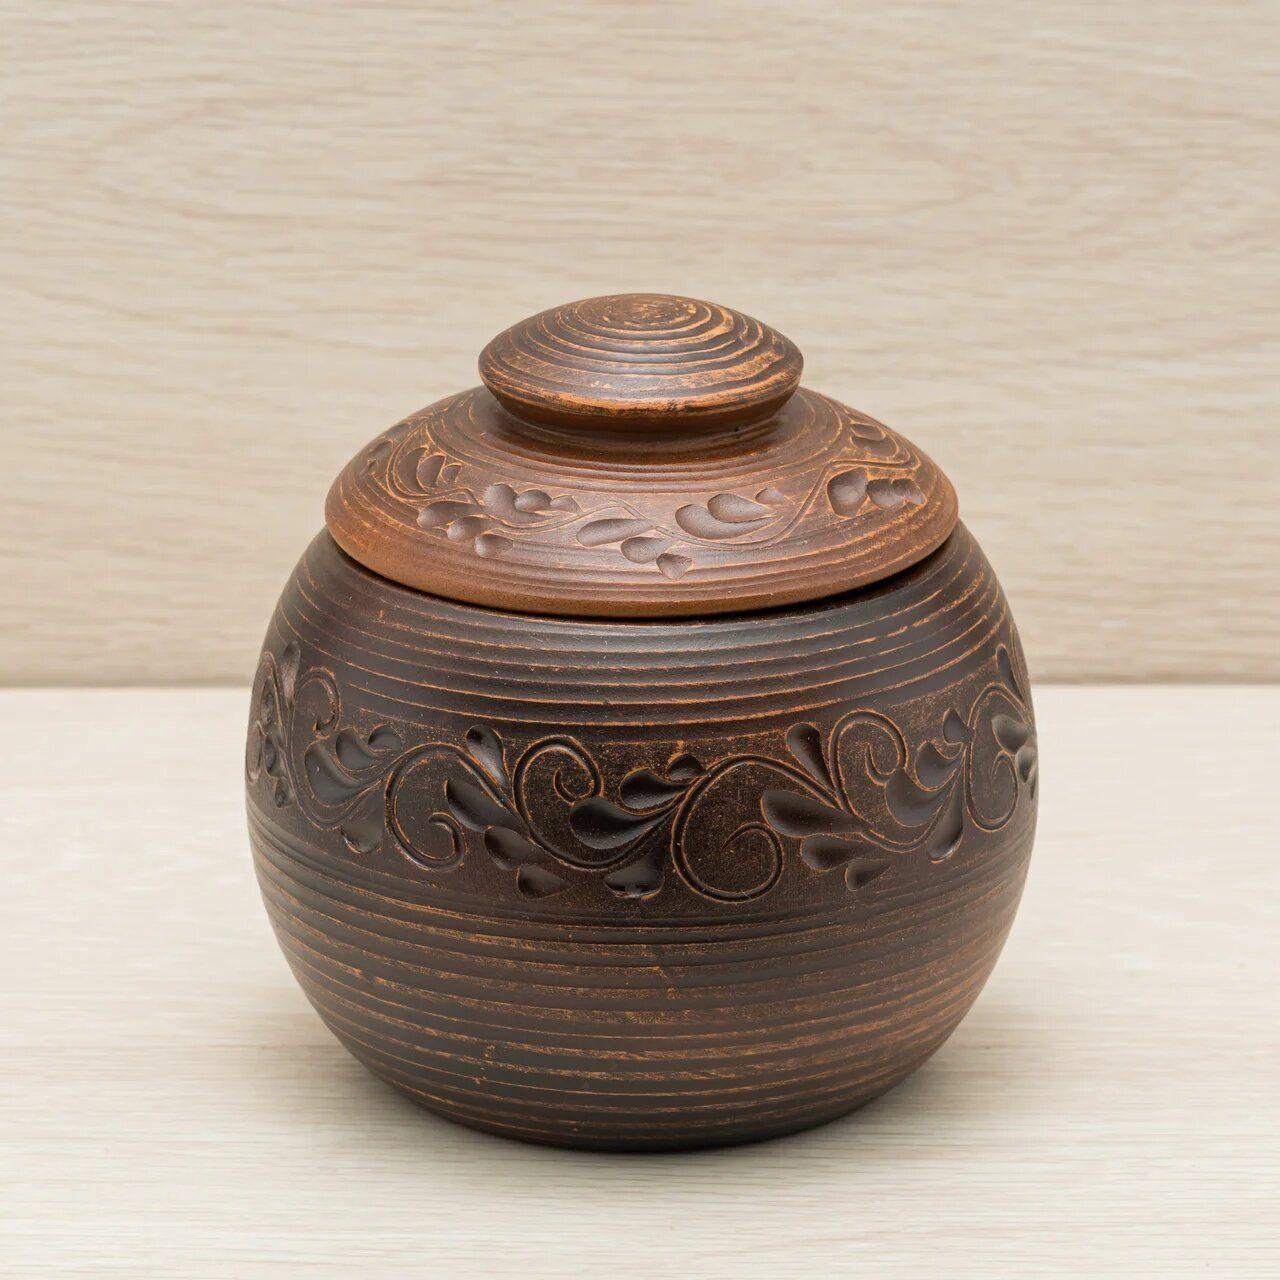 Pottery Baking Pot With Lid Clay Baking Pot Pottery Pot For Etsy In 2020 Pottery Pot Baking Clay Ceramic Pot